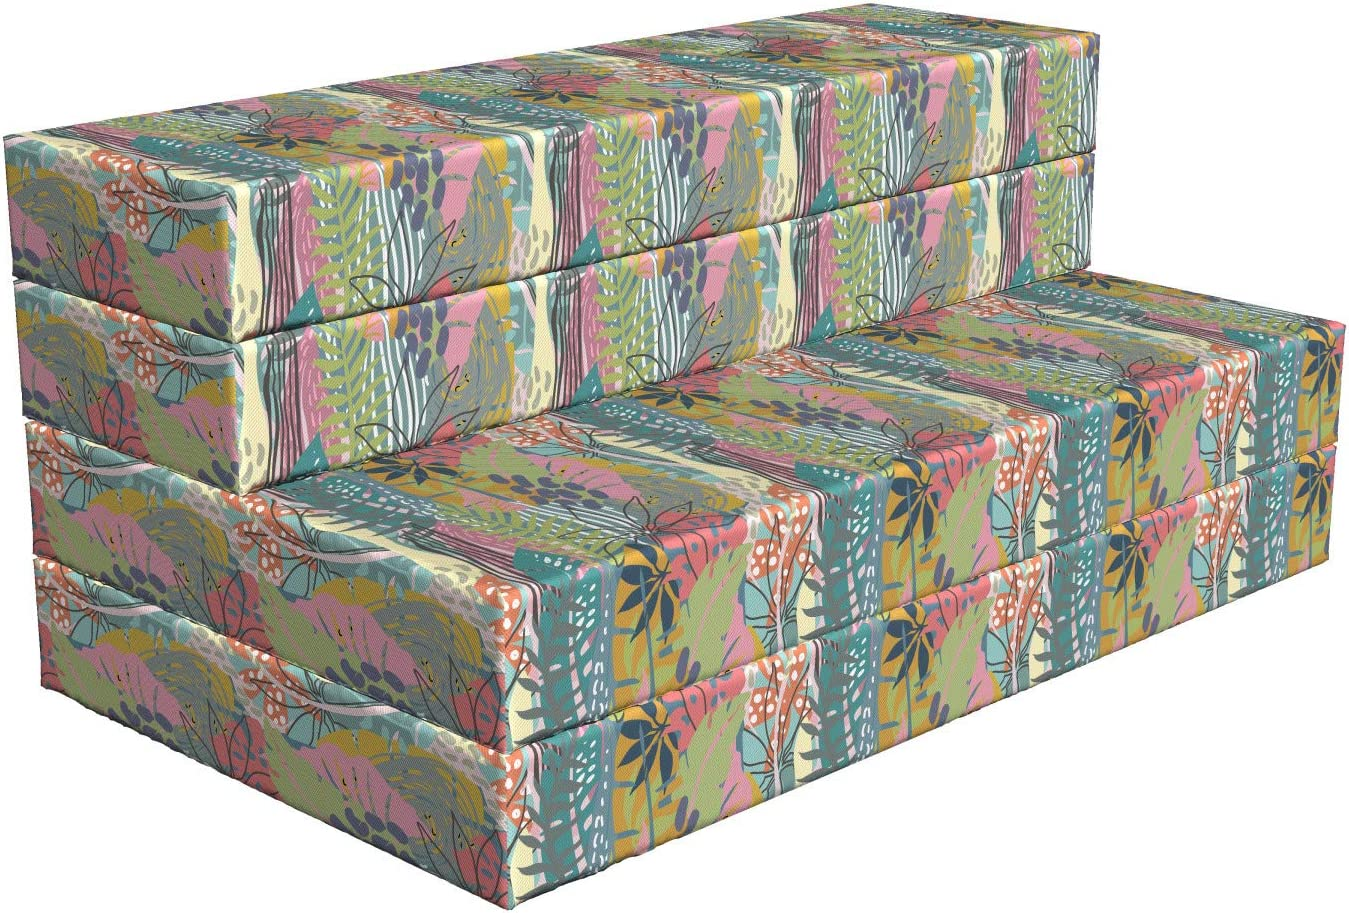 Lunarable cheap Jungle Foldable Mattress Pastel New life 7 Arrangement Plants